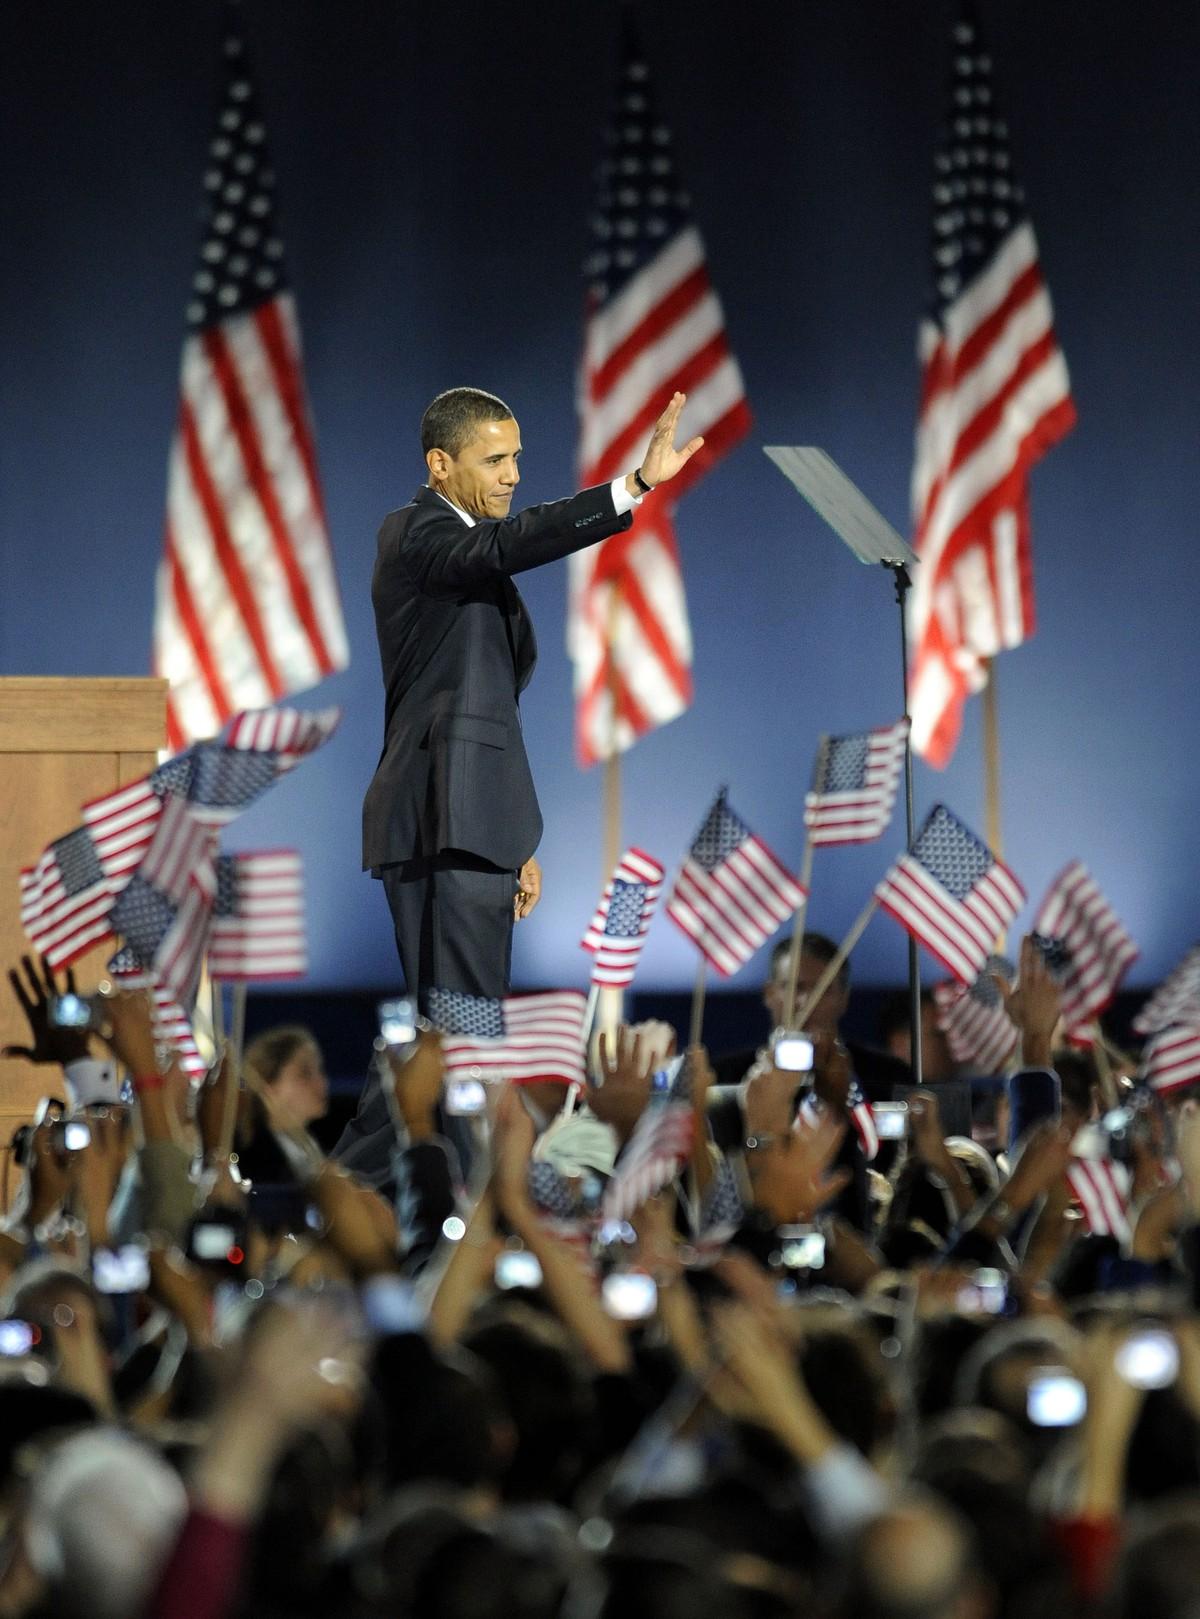 Essay on obamas victory speech best online homework help sites     It Just so Happened fx s   mt essay